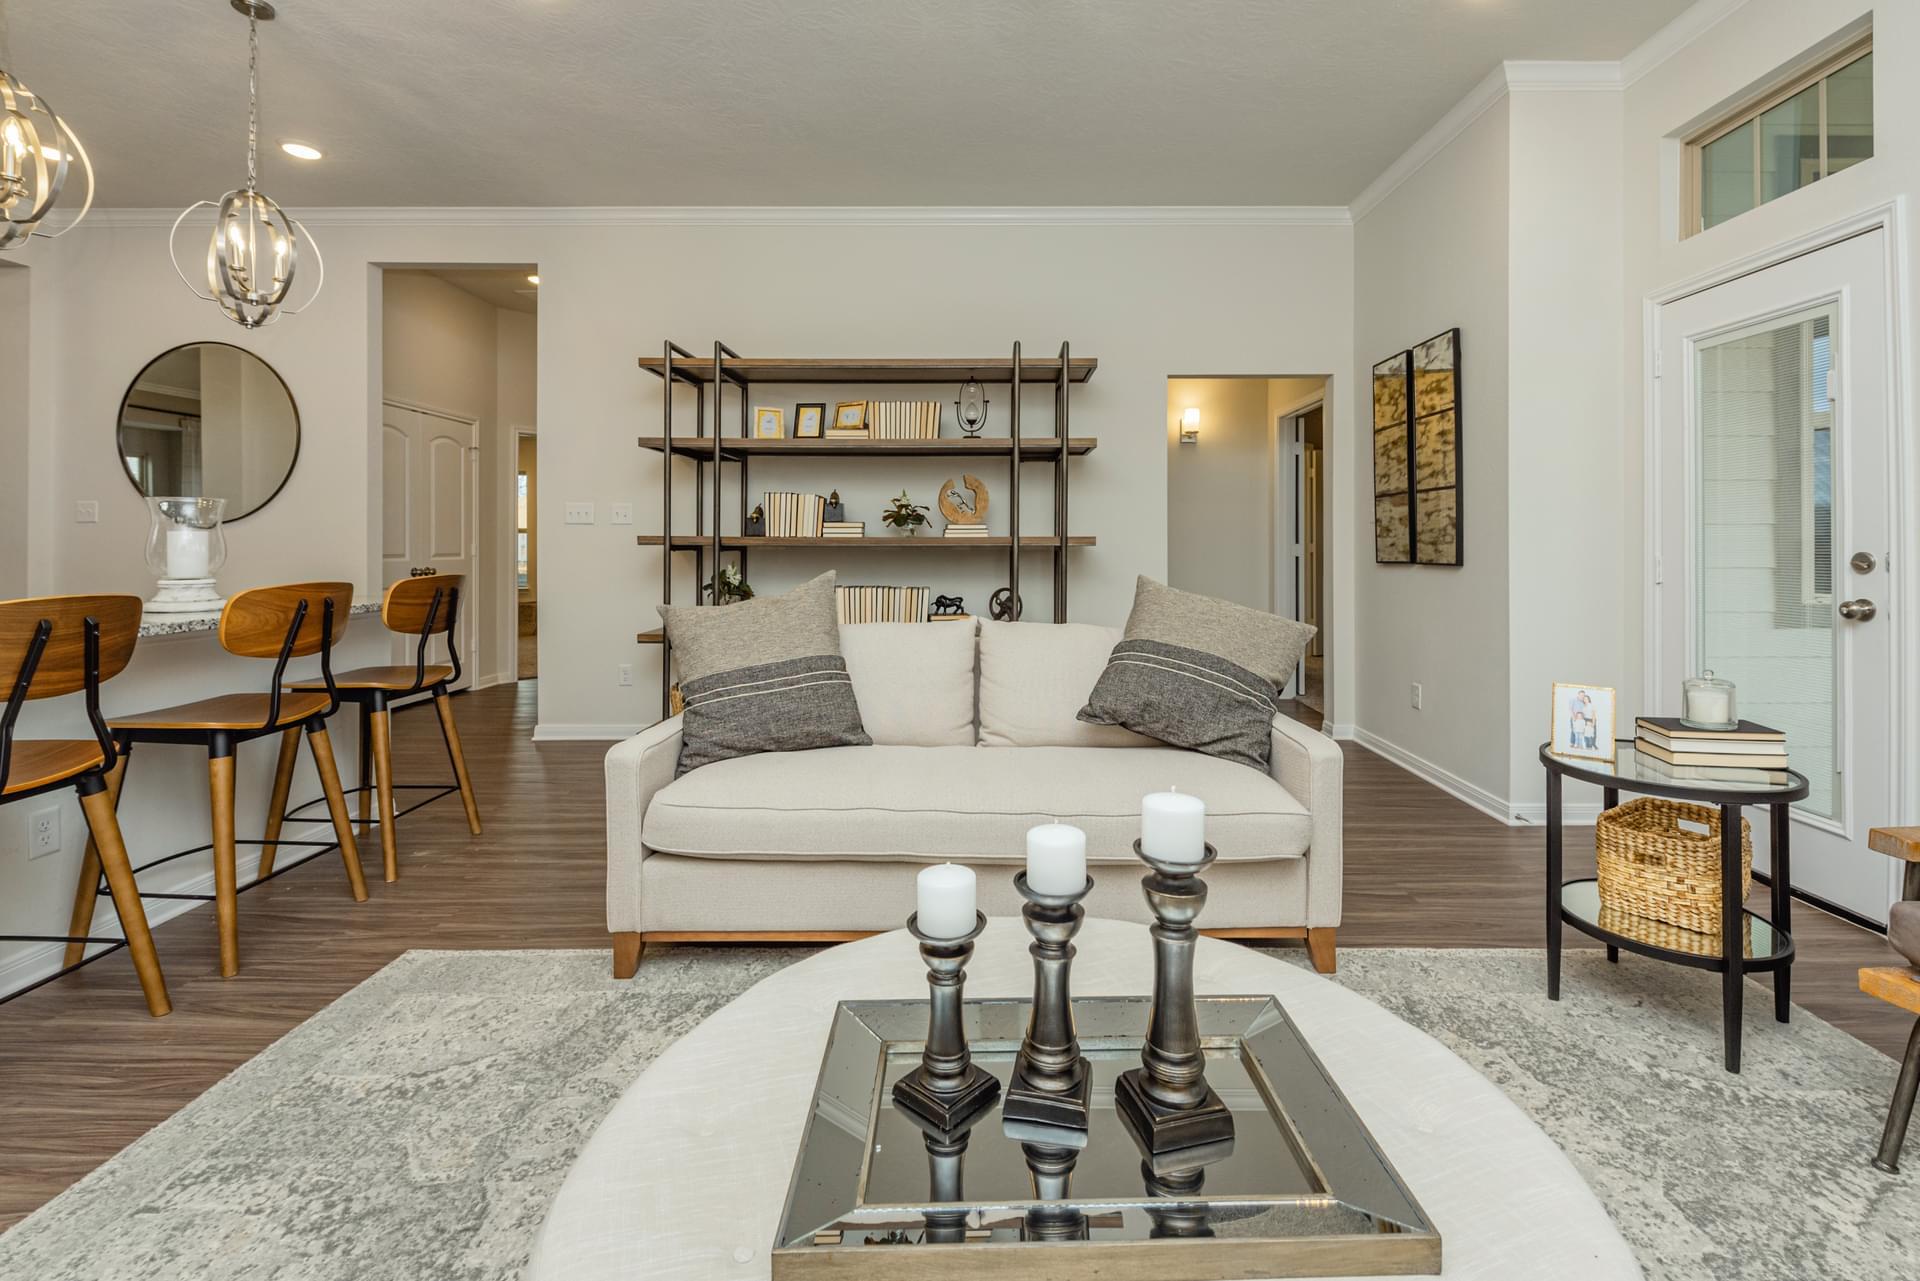 1,620sf New Home in Belton, TX